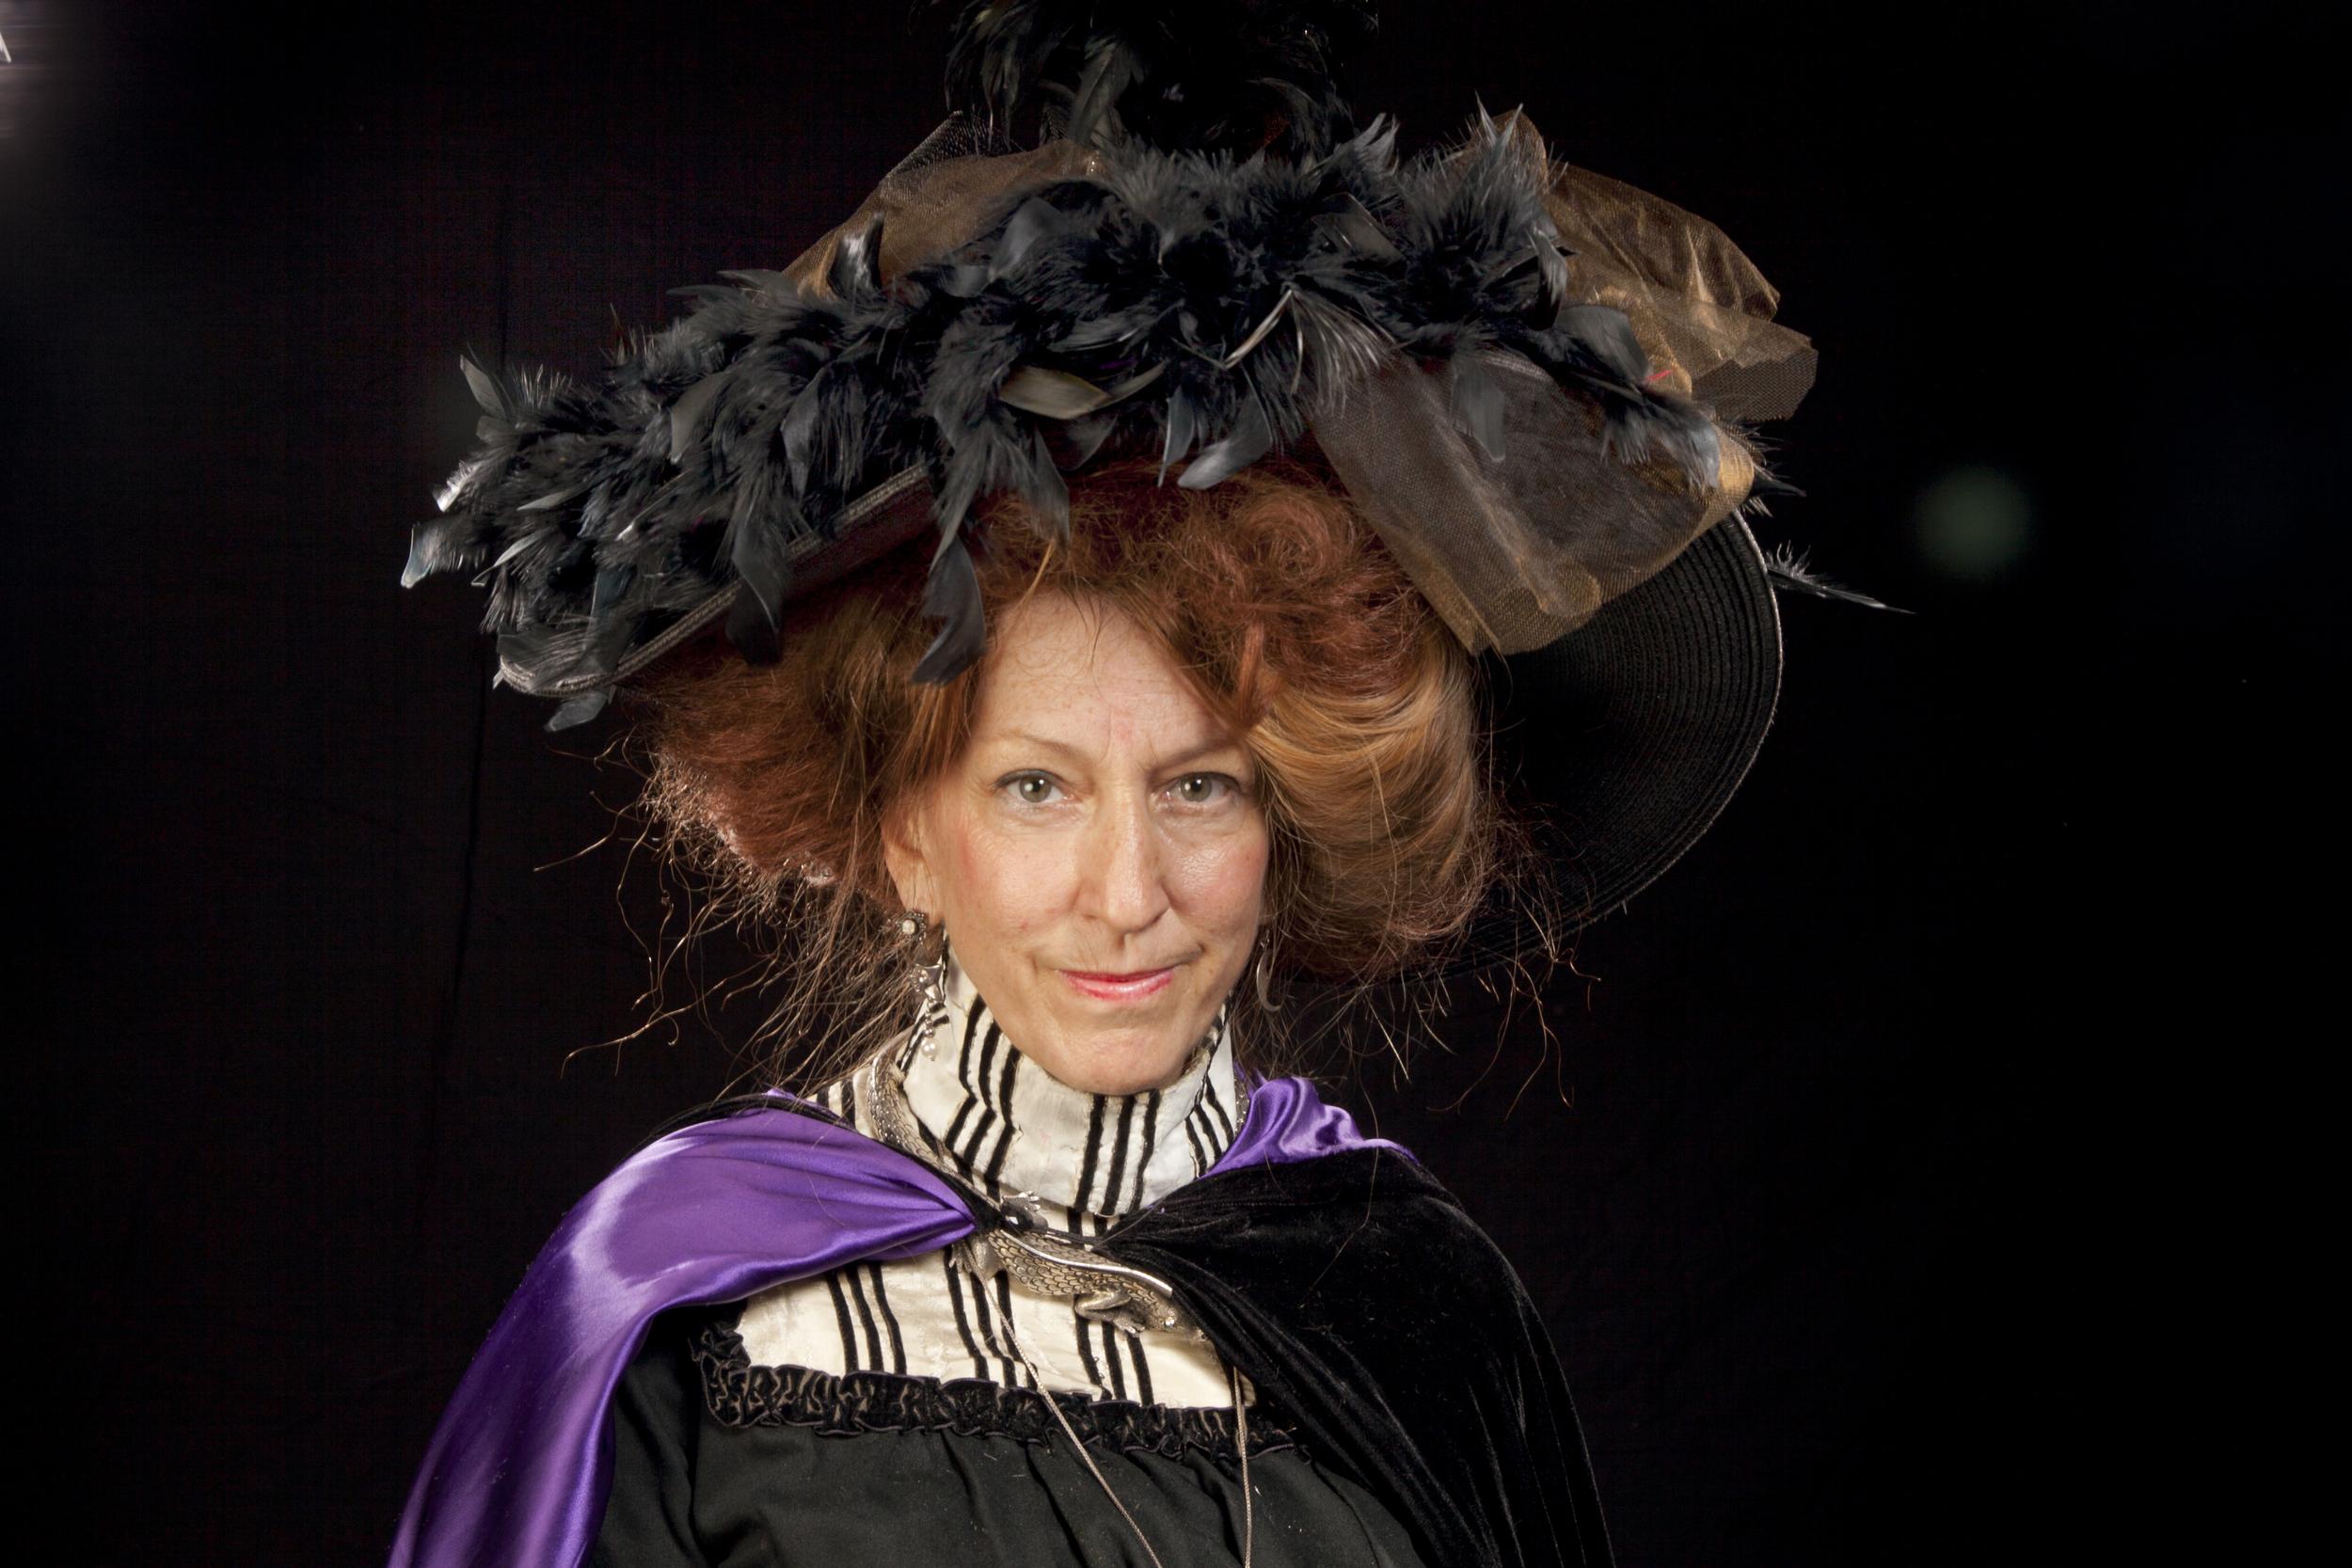 Large black feather hat, puple capeIMG_4381.jpg